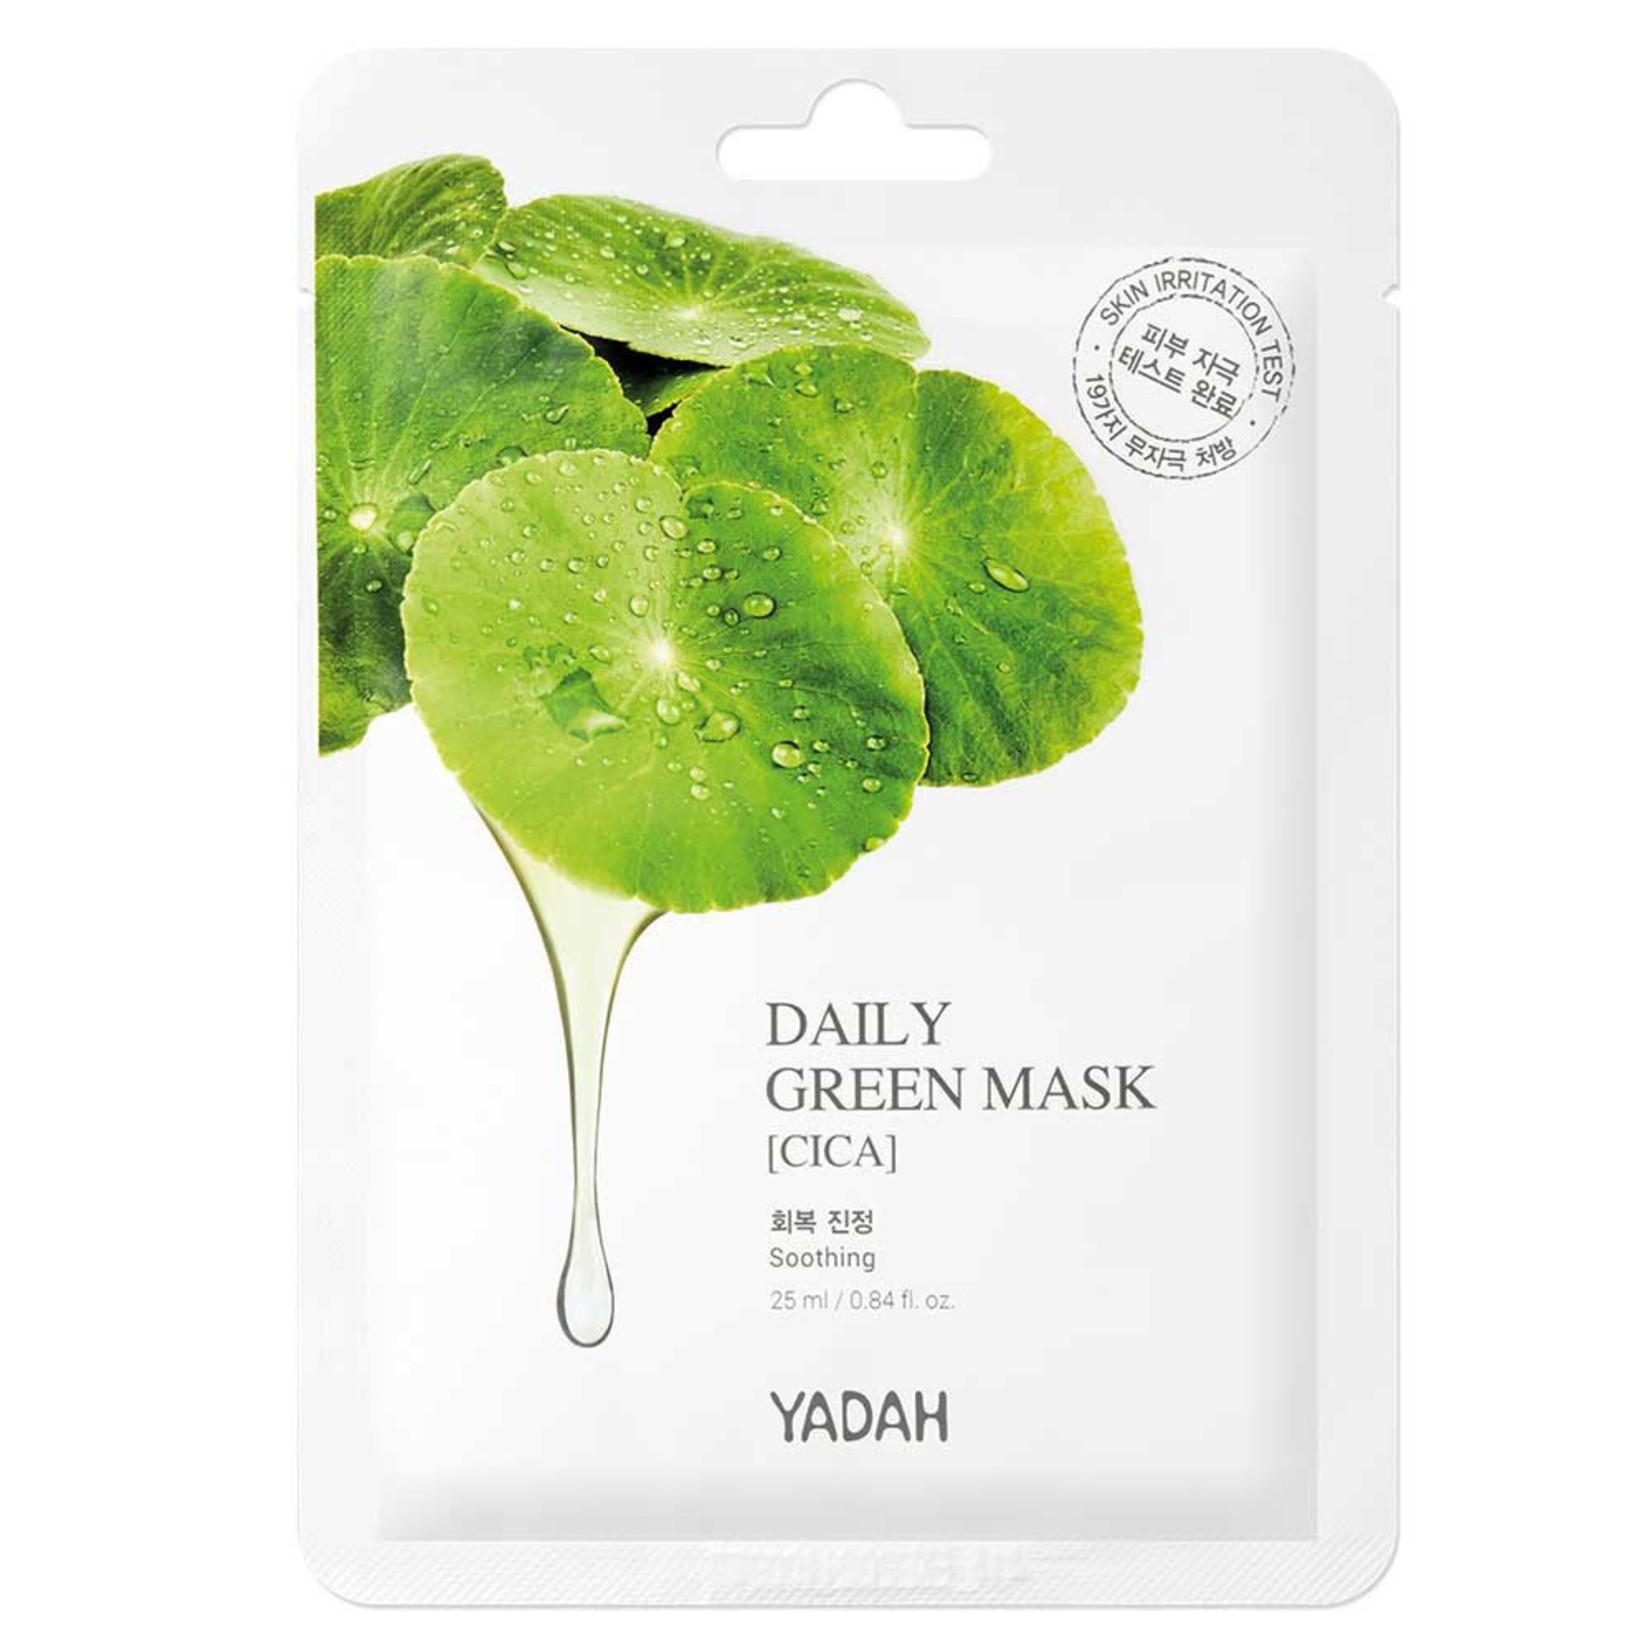 Yadah Daily Green Cica Mask 10 pcs